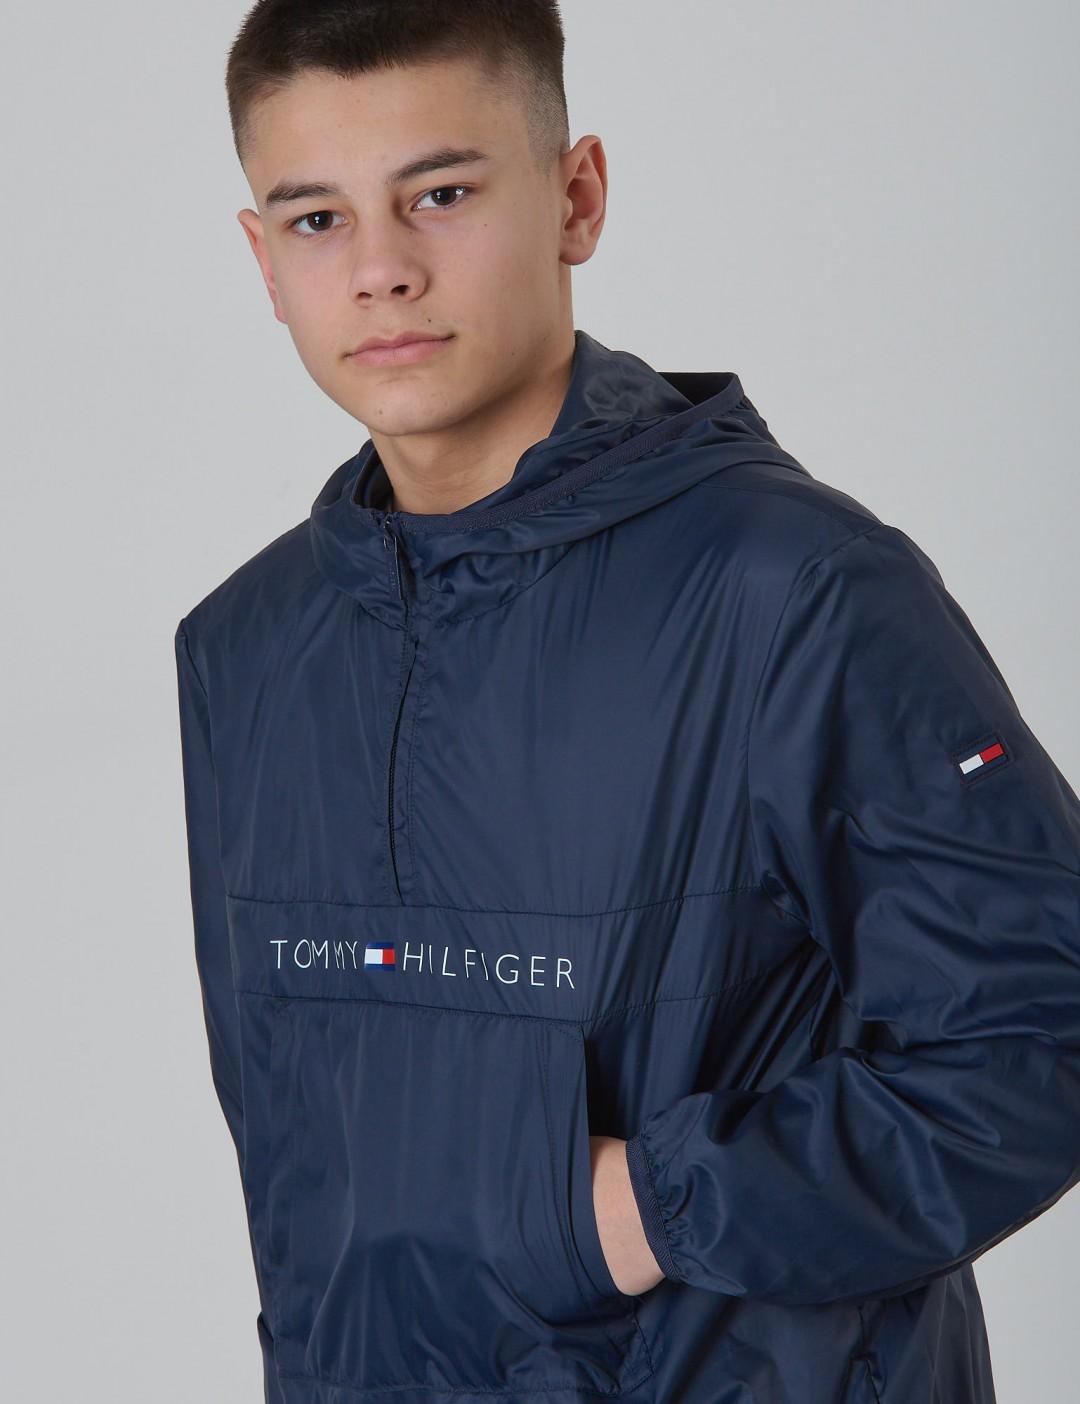 d8a646fd439e9 Pop-Over Jacket - Blau - Tommy Hilfiger